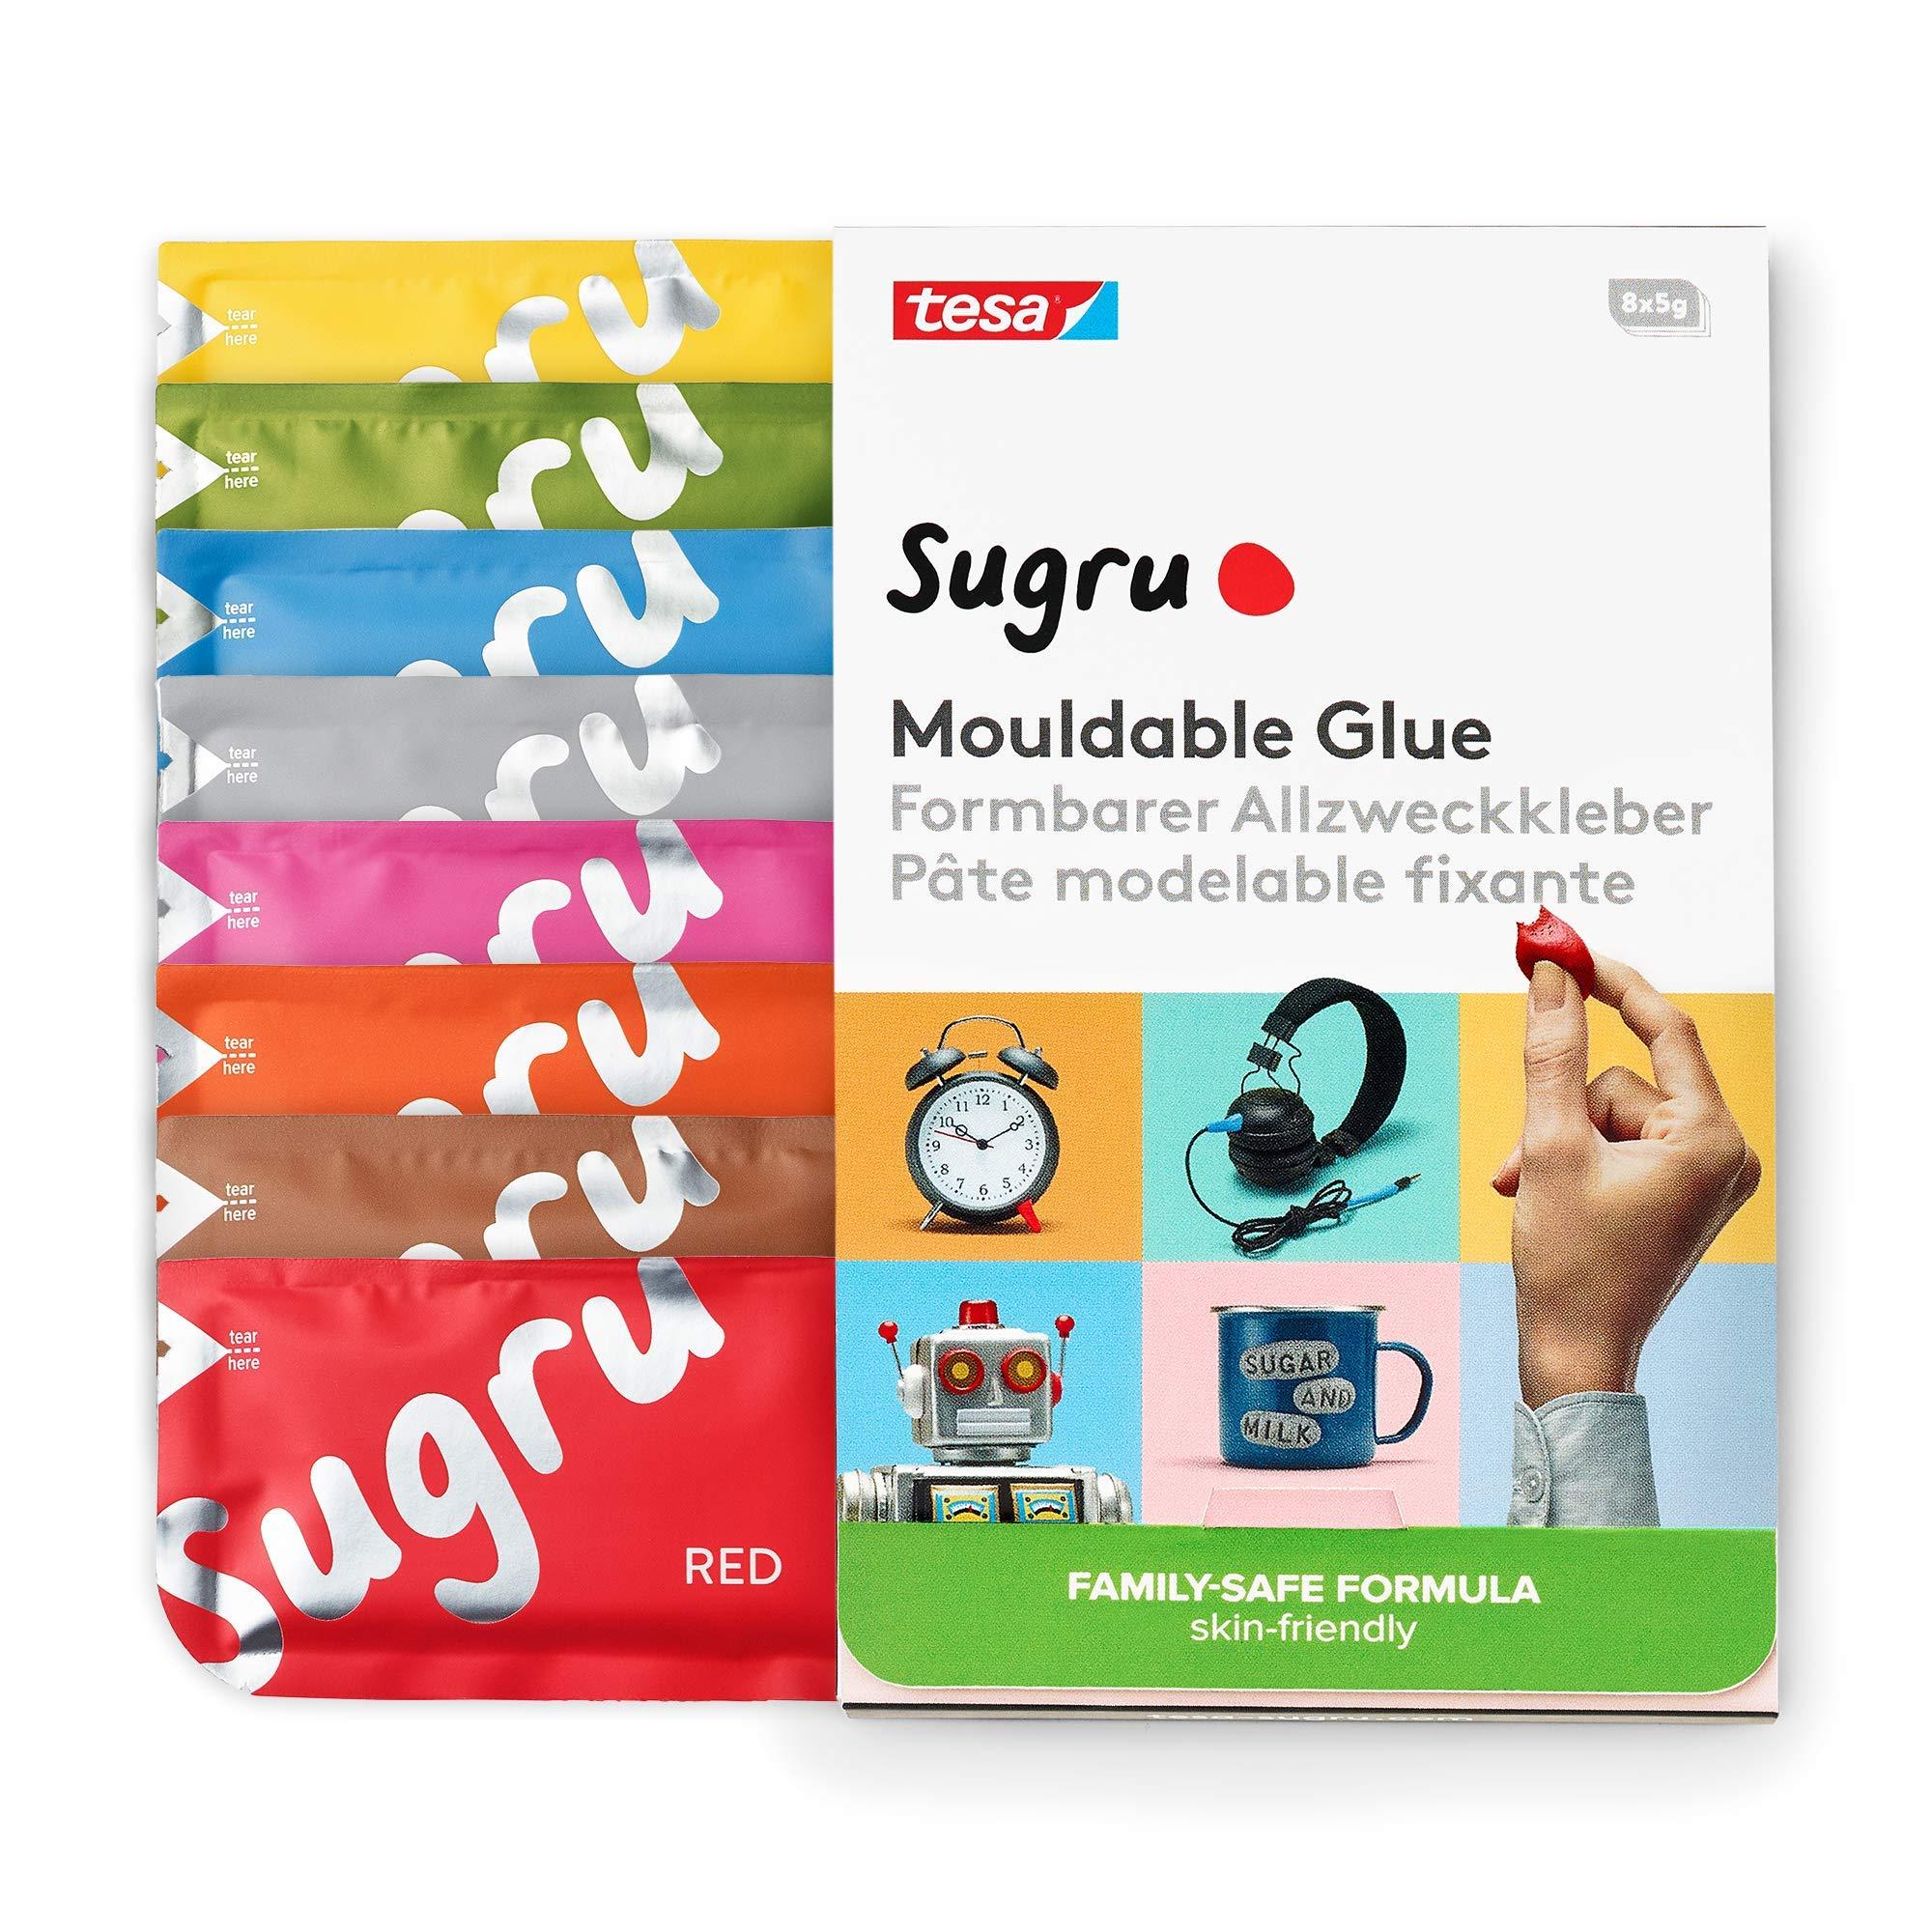 Tesa 41031 Sugru Malleable All-Purpose Glue Family Formula Very Skin-Friendly Maximum Load 2 kg, 41081 by tesa UK